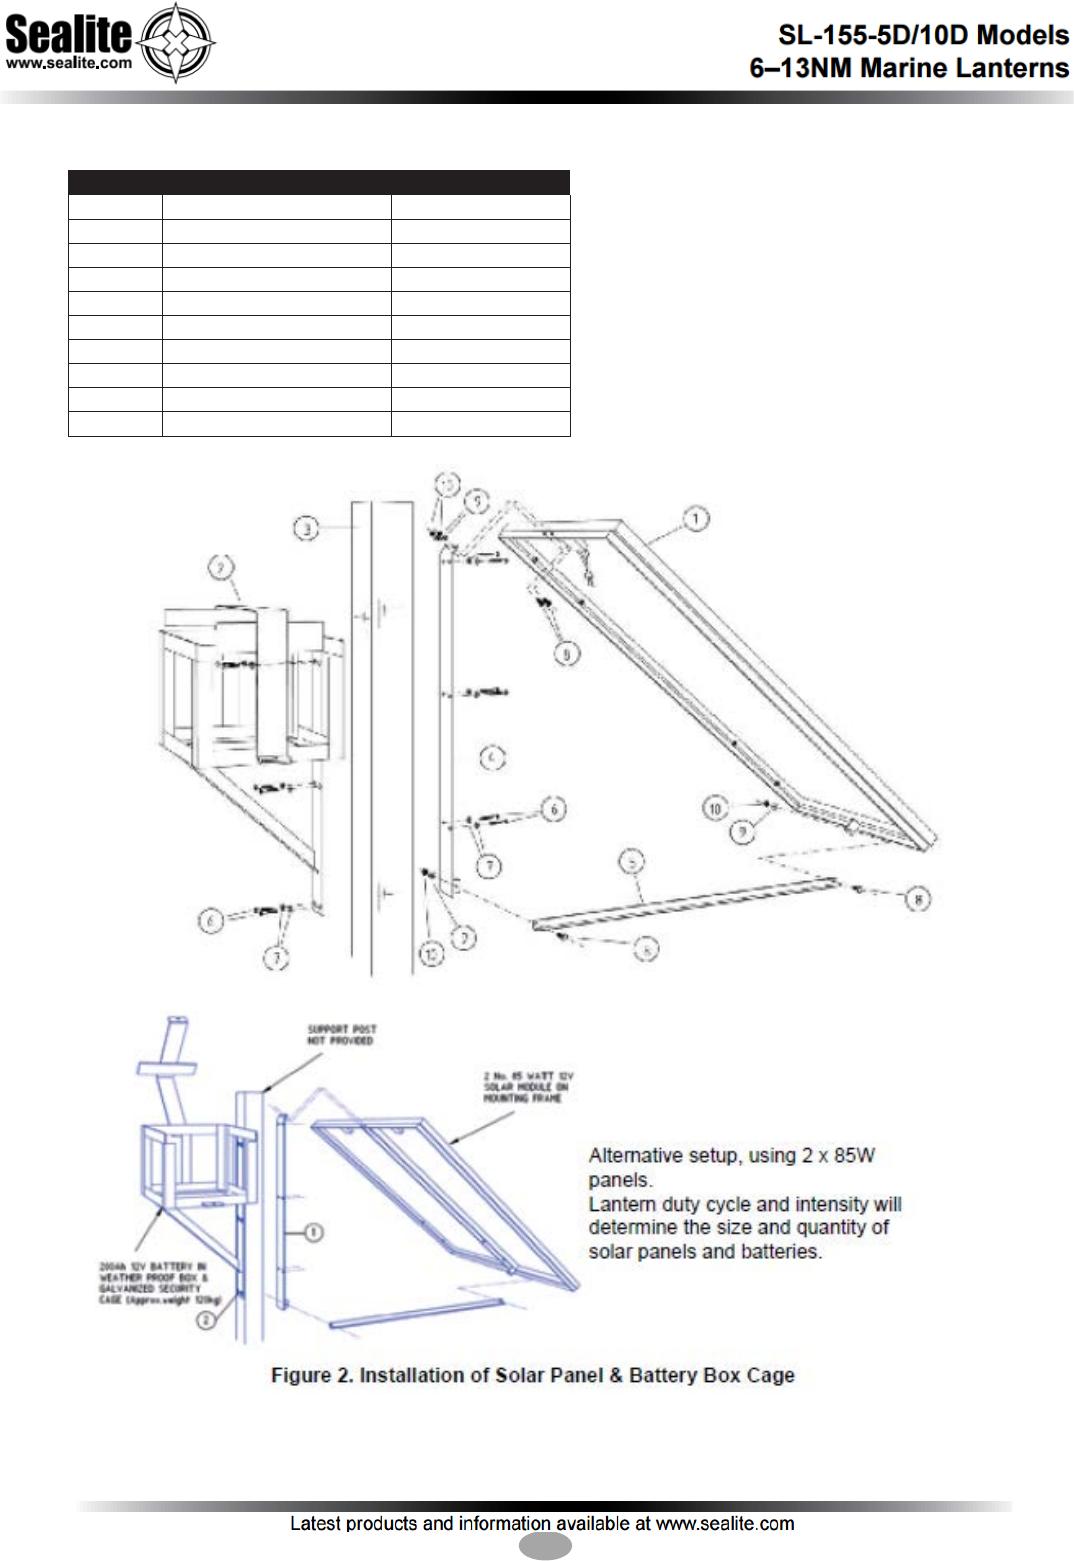 Sl 155 Ais T1 T3 Installation Manual Rev3 Usb 2036 46 Wiring Diagram 42